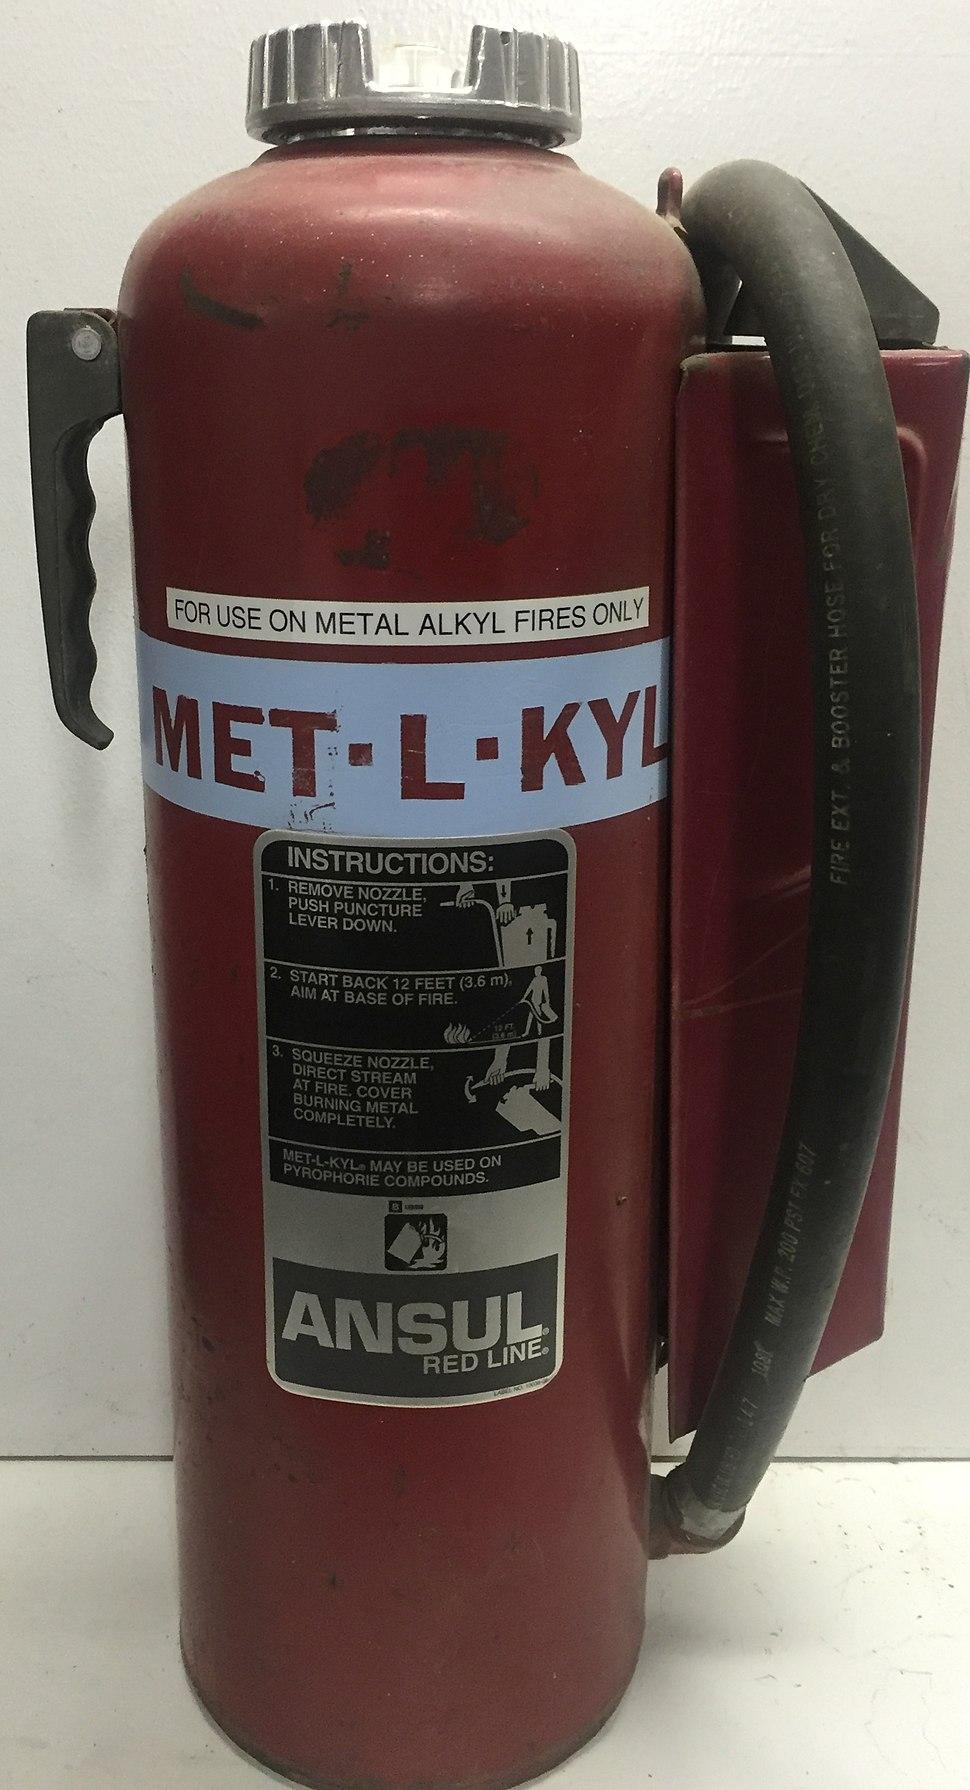 Met-L-Kyl Fire Extinguisher